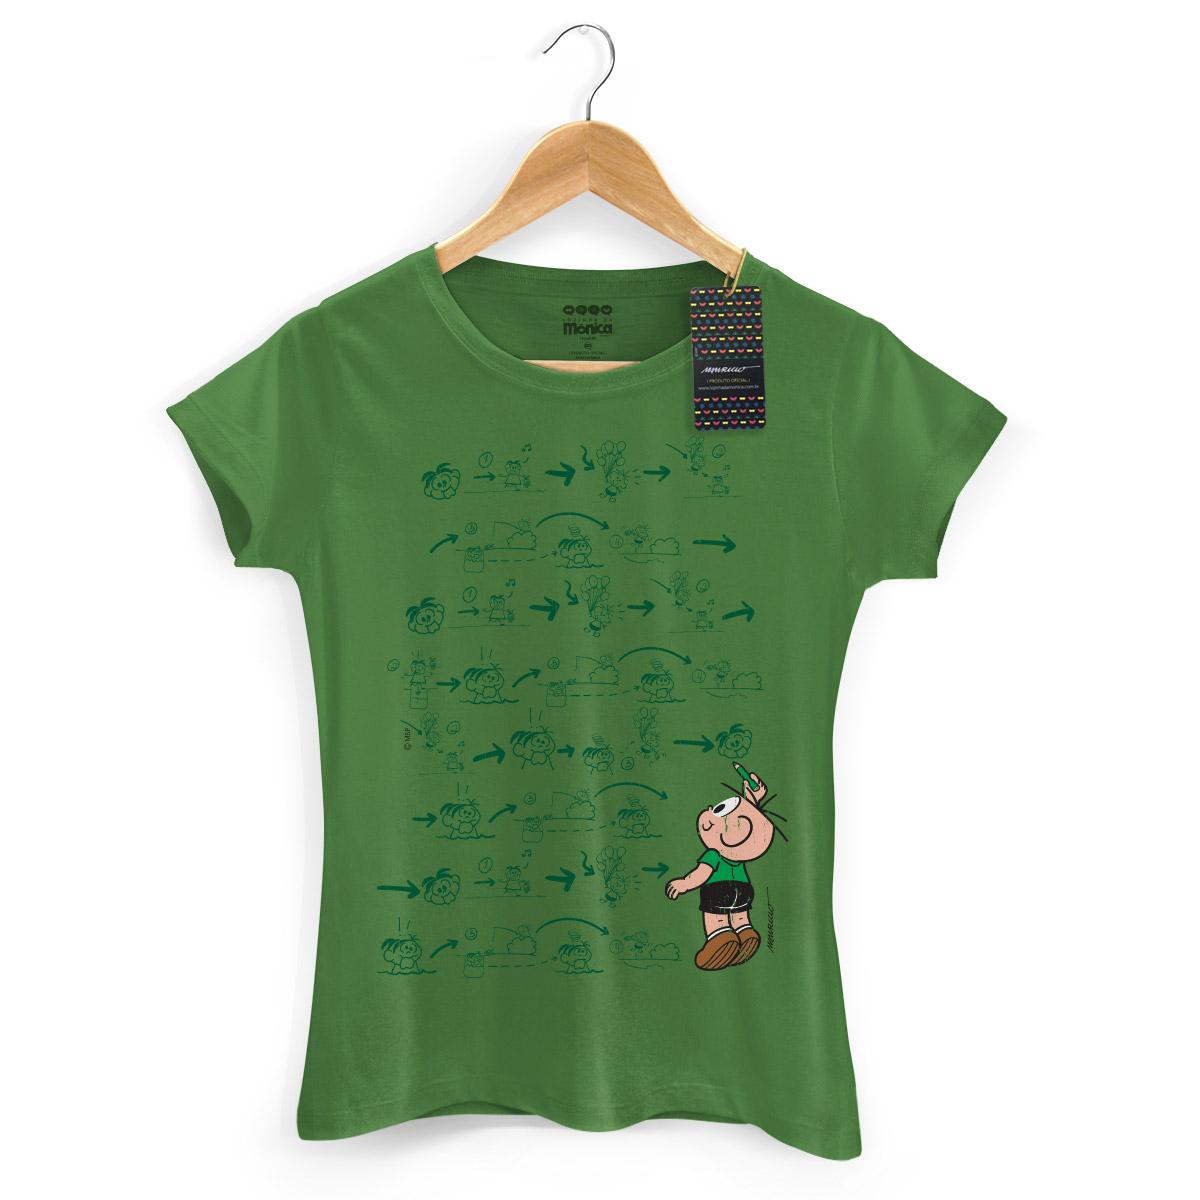 Camiseta Feminina Turma Da M�nica Cool Green Cebolinha